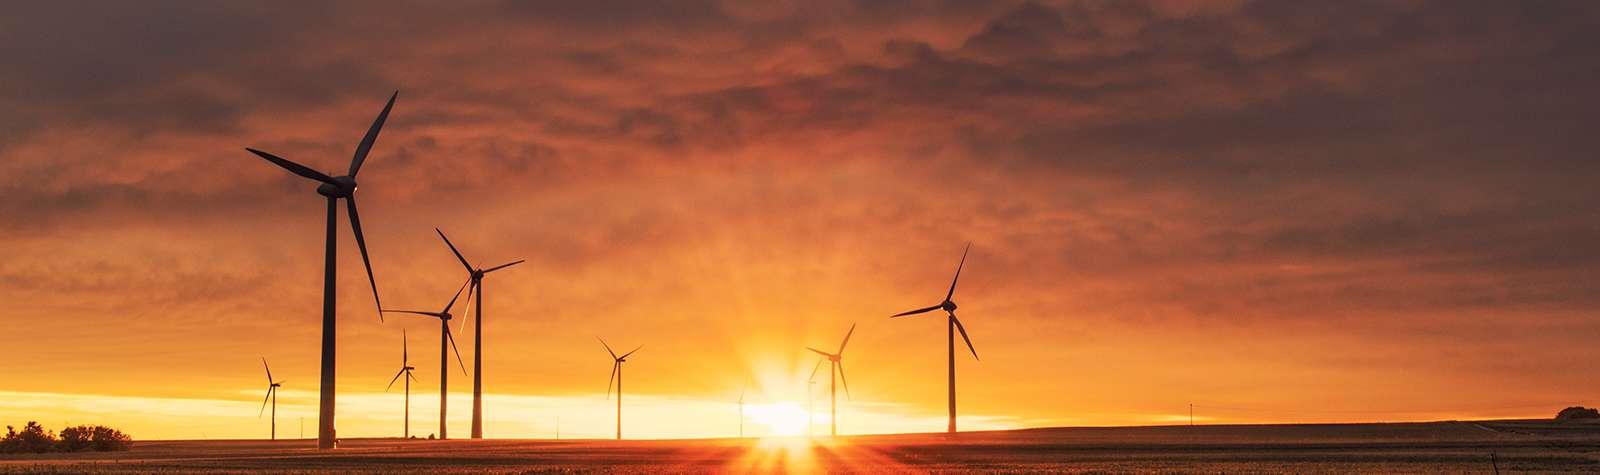 The World Forum on Enterprise & the Environment